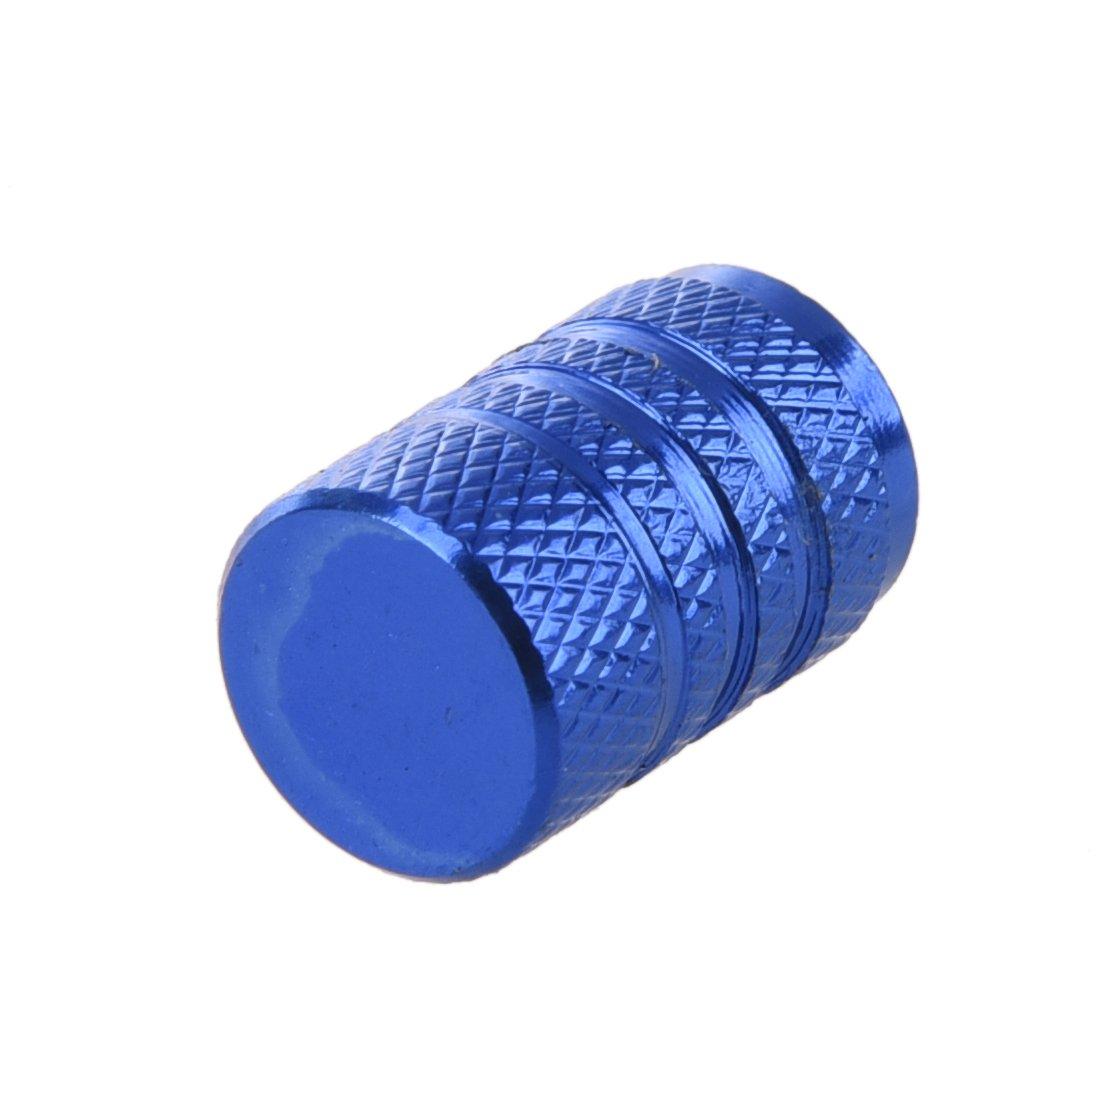 R 4 Stuecke blau Legierung Auto Reifen Ventilkappen Autoventil Verschlusskappen SODIAL Autoreifen Ventilkappen